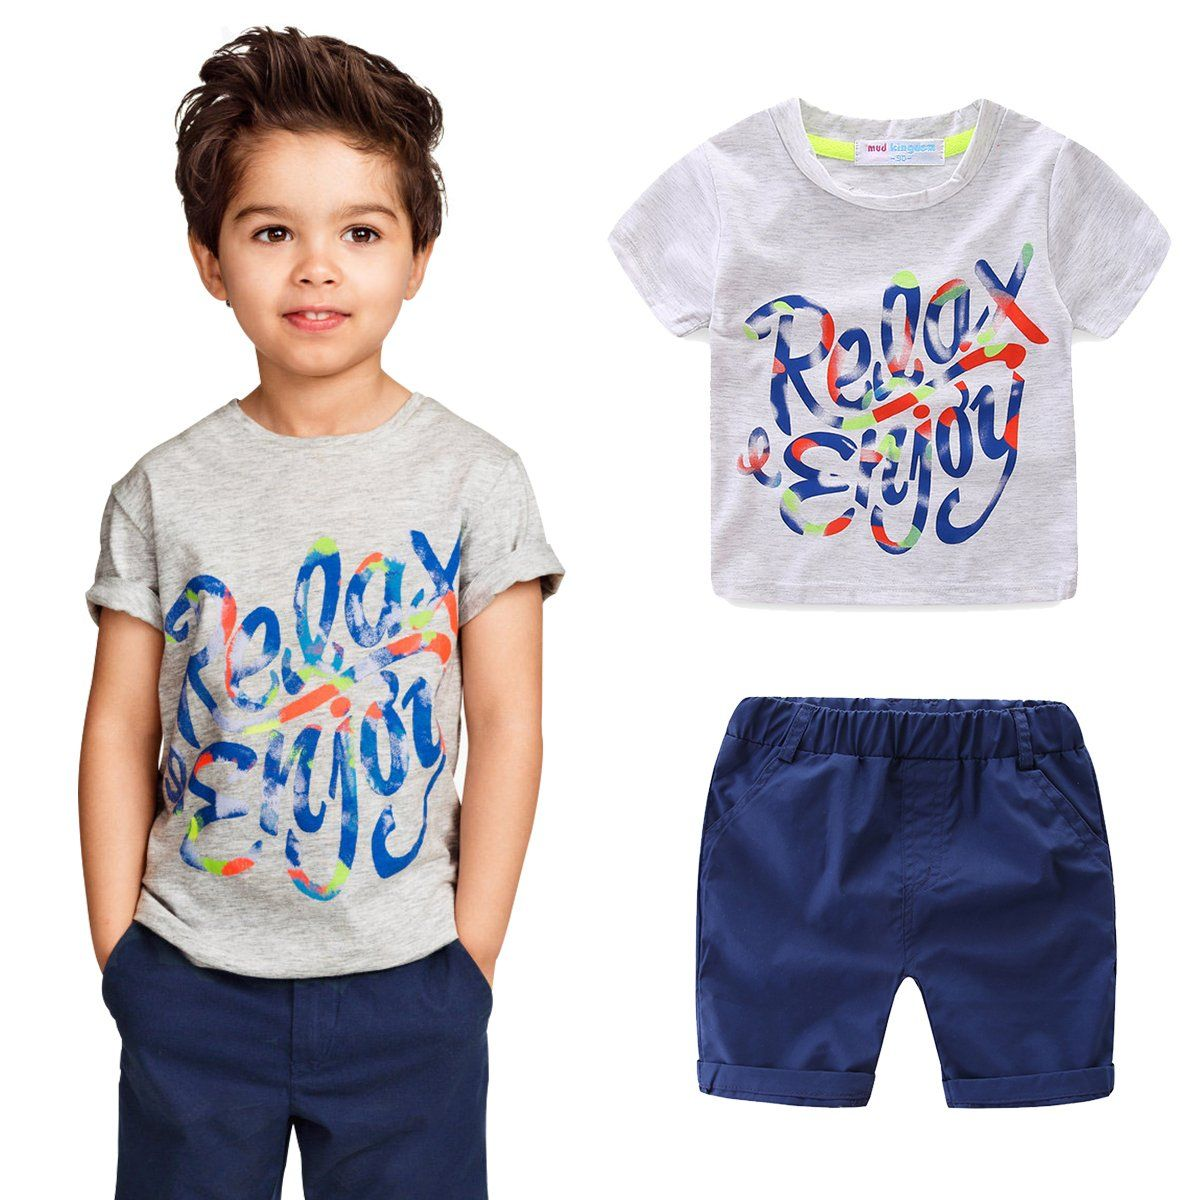 Mud Kingdom Little Boy Outfits Summer Holiday Enjoy Relax